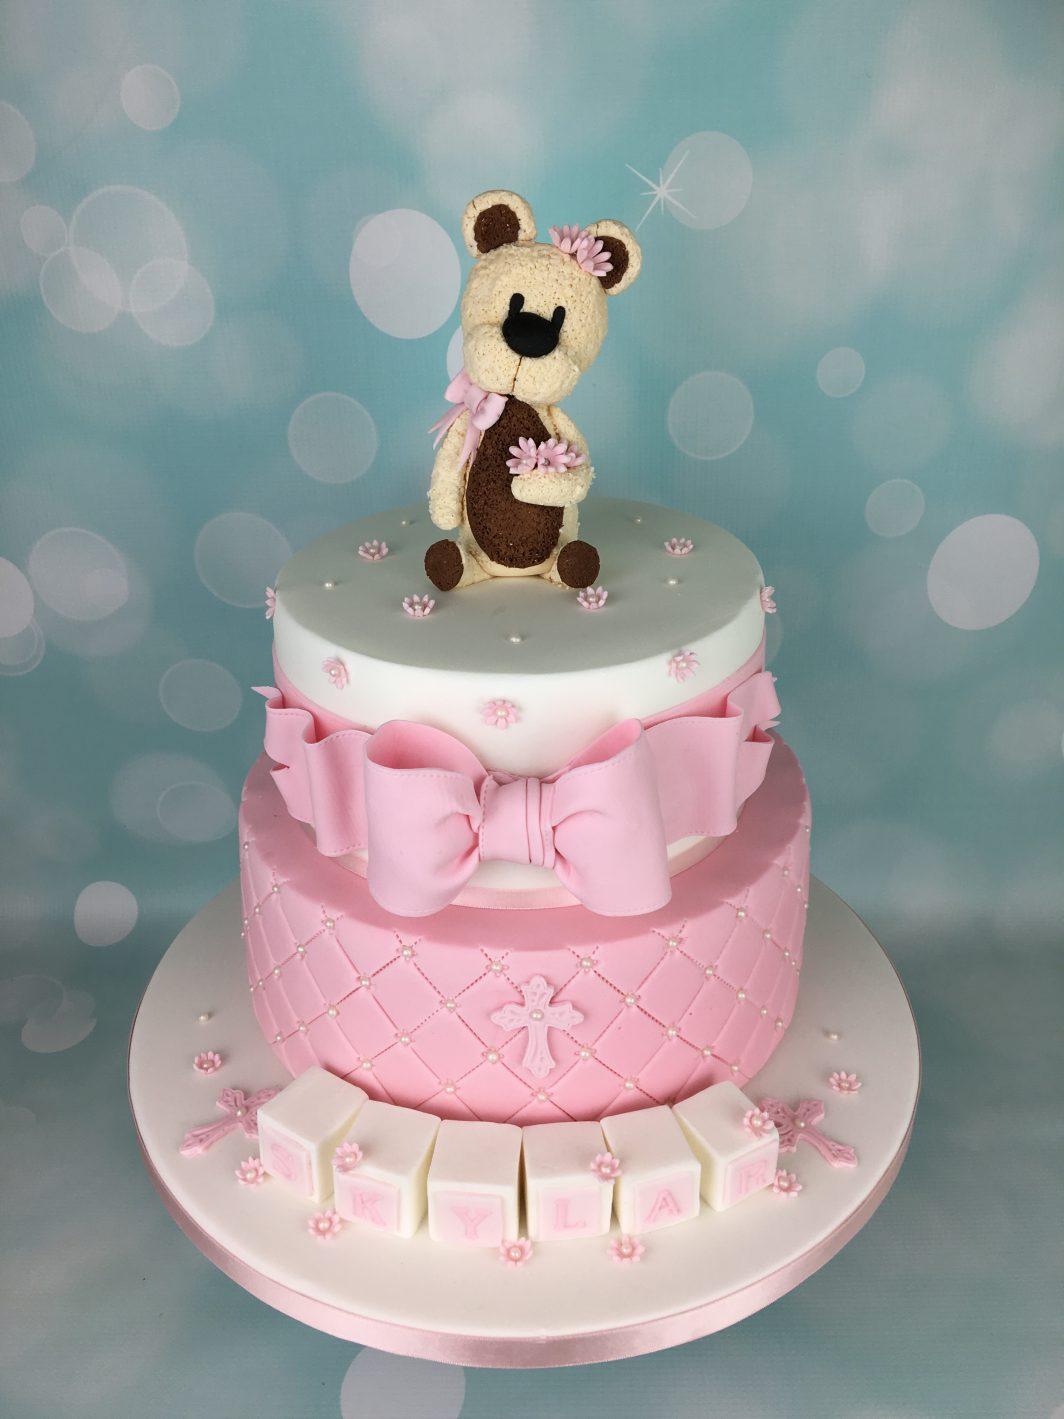 Pink Bow cake